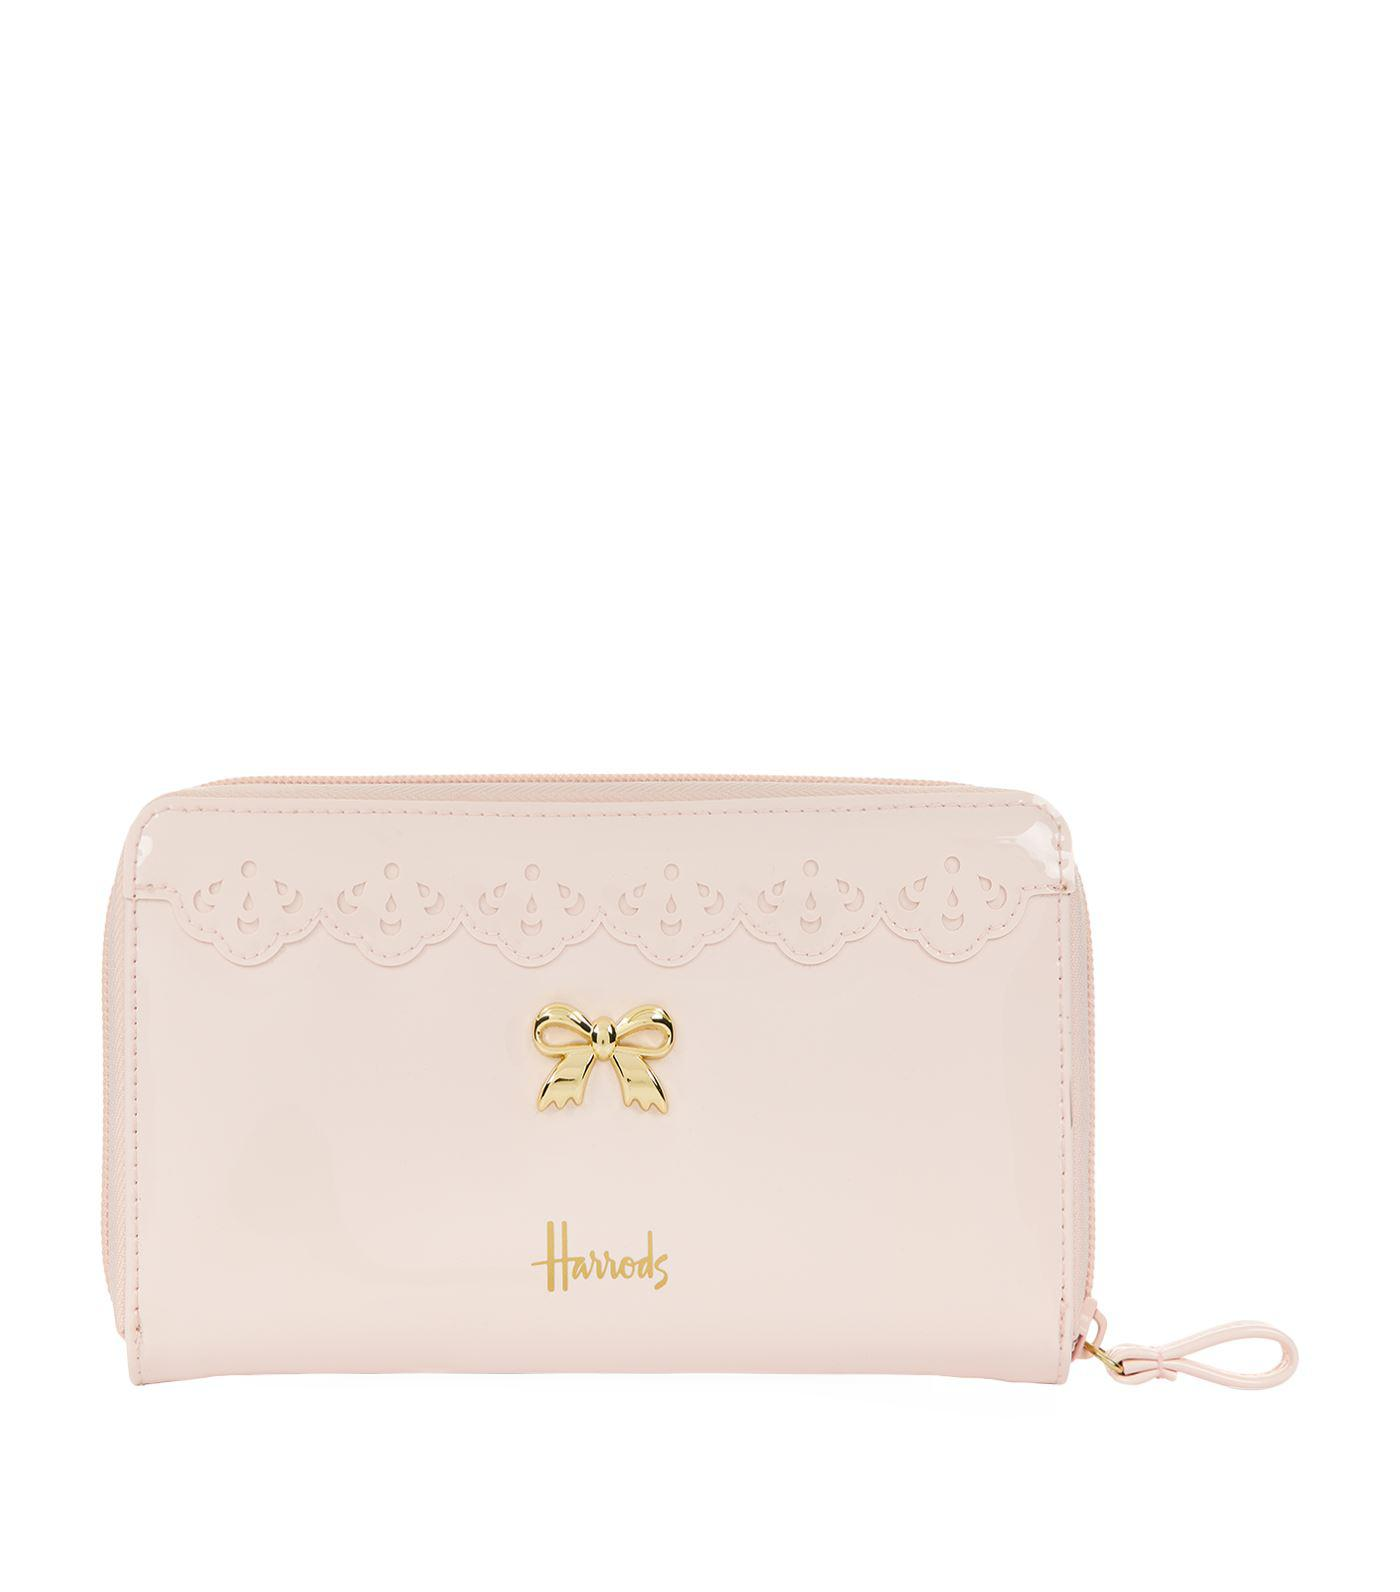 b3e3f07600 Harrods Vintage Lace Zip Around Wallet in Pink - Lyst